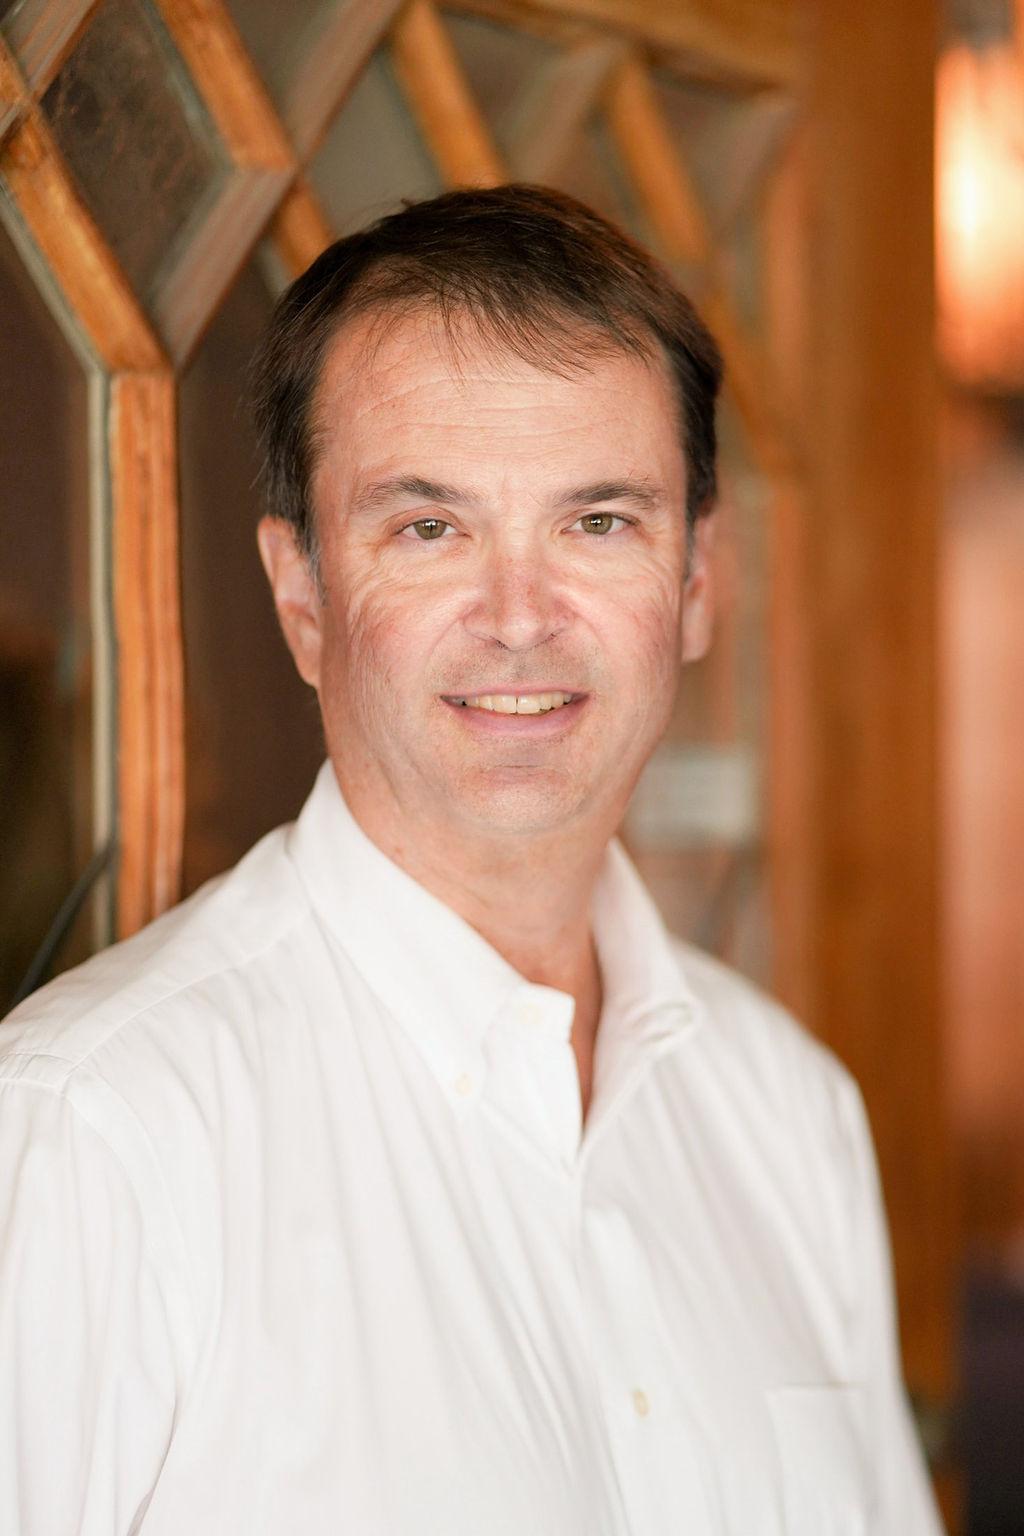 Bennett J. Roberts, attorney, photo